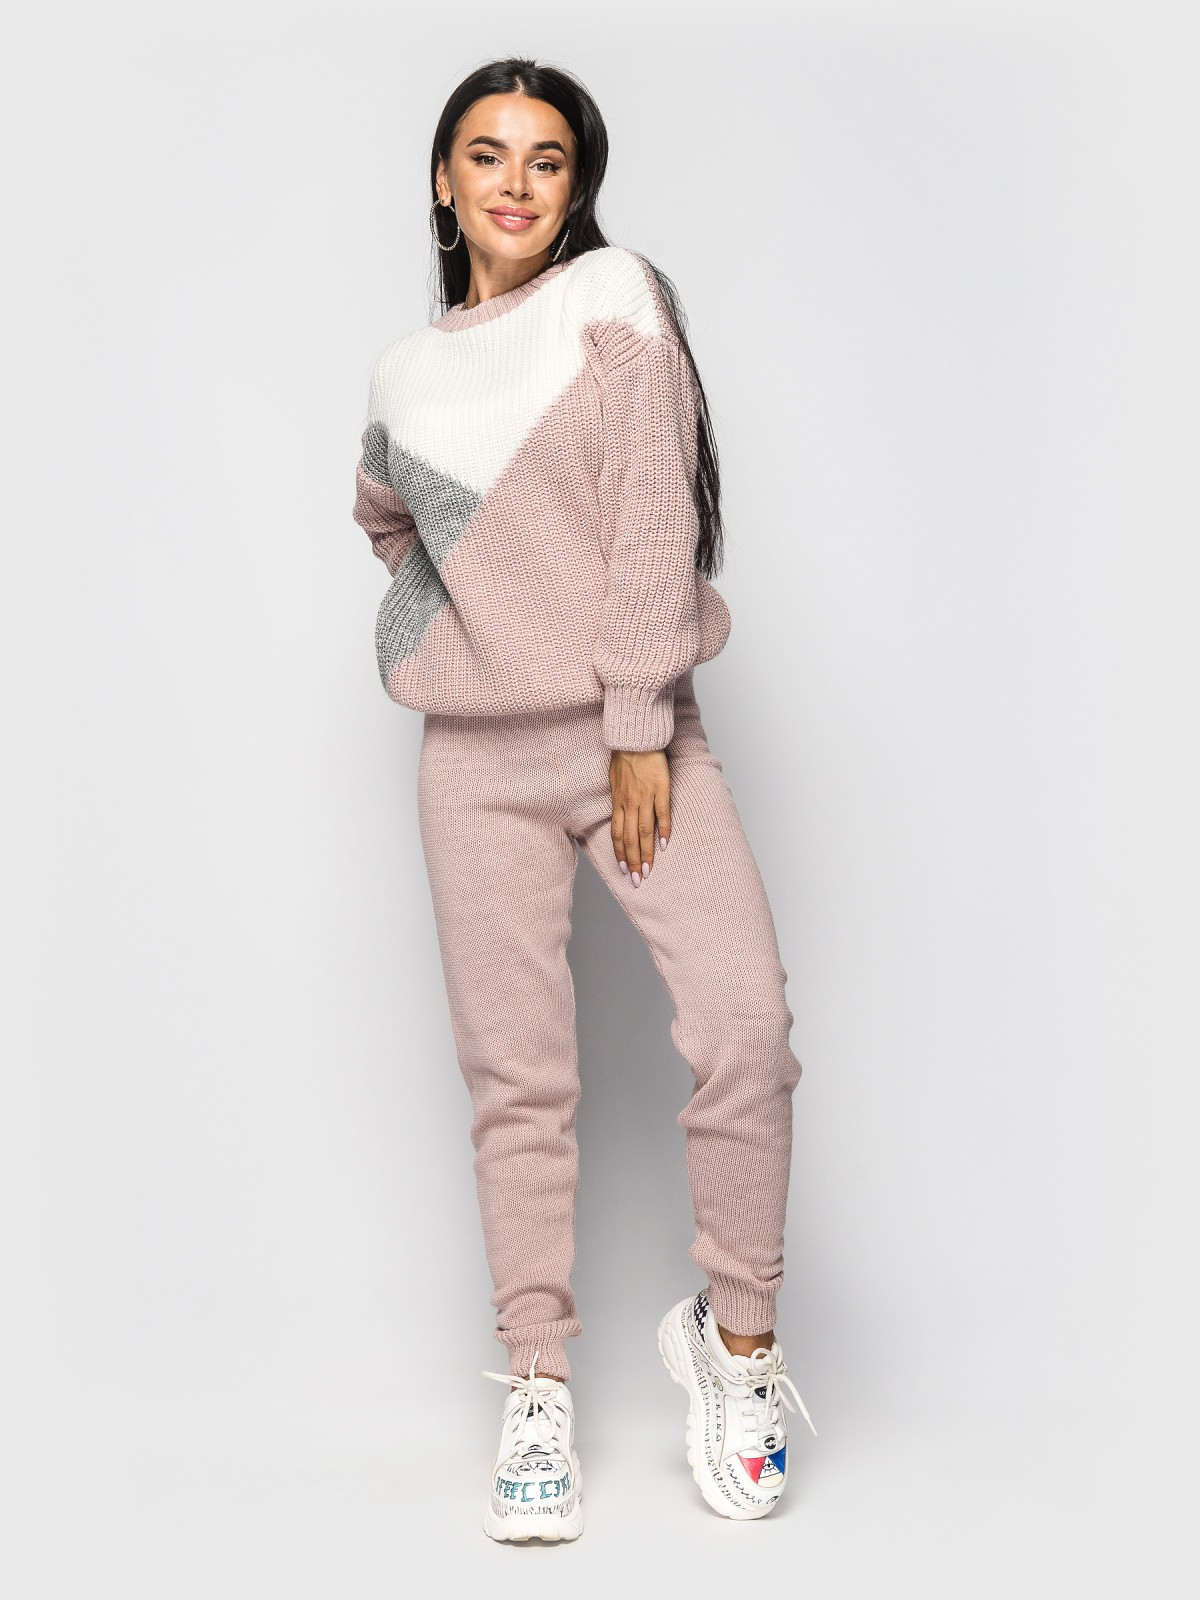 Комплект вязаный Nelson Розовый-серый-белый